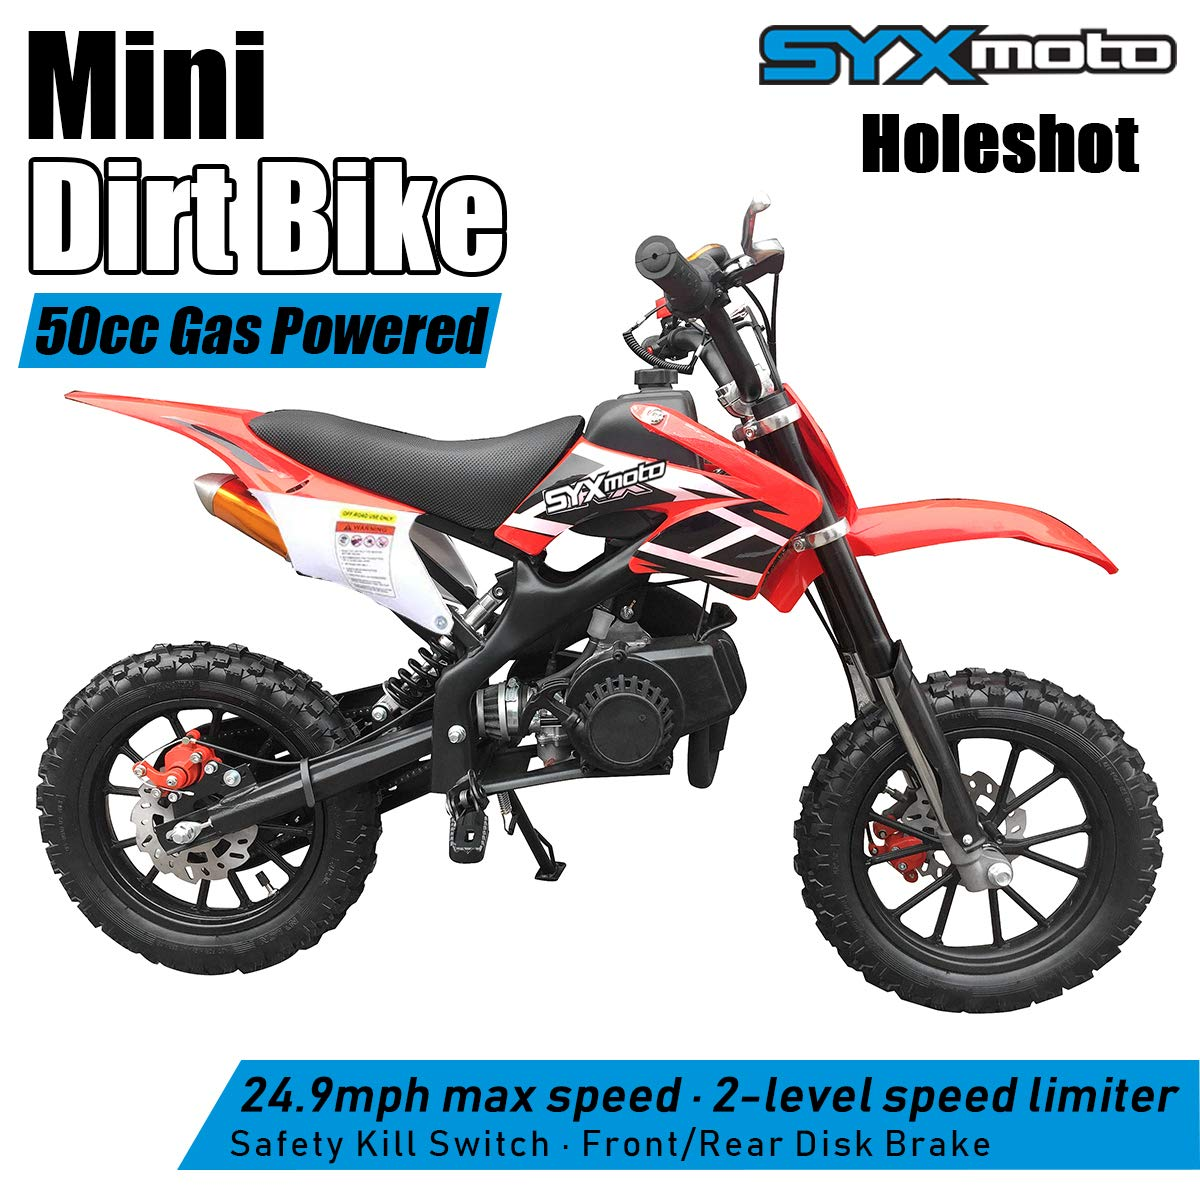 Fully Automatic Transmission SYX MOTO Kids Mini Dirt Bike Gas Power 2-Stroke 50cc Motorcycle Holeshot Off Road Motorcycle Holeshot Pit Bike Orange